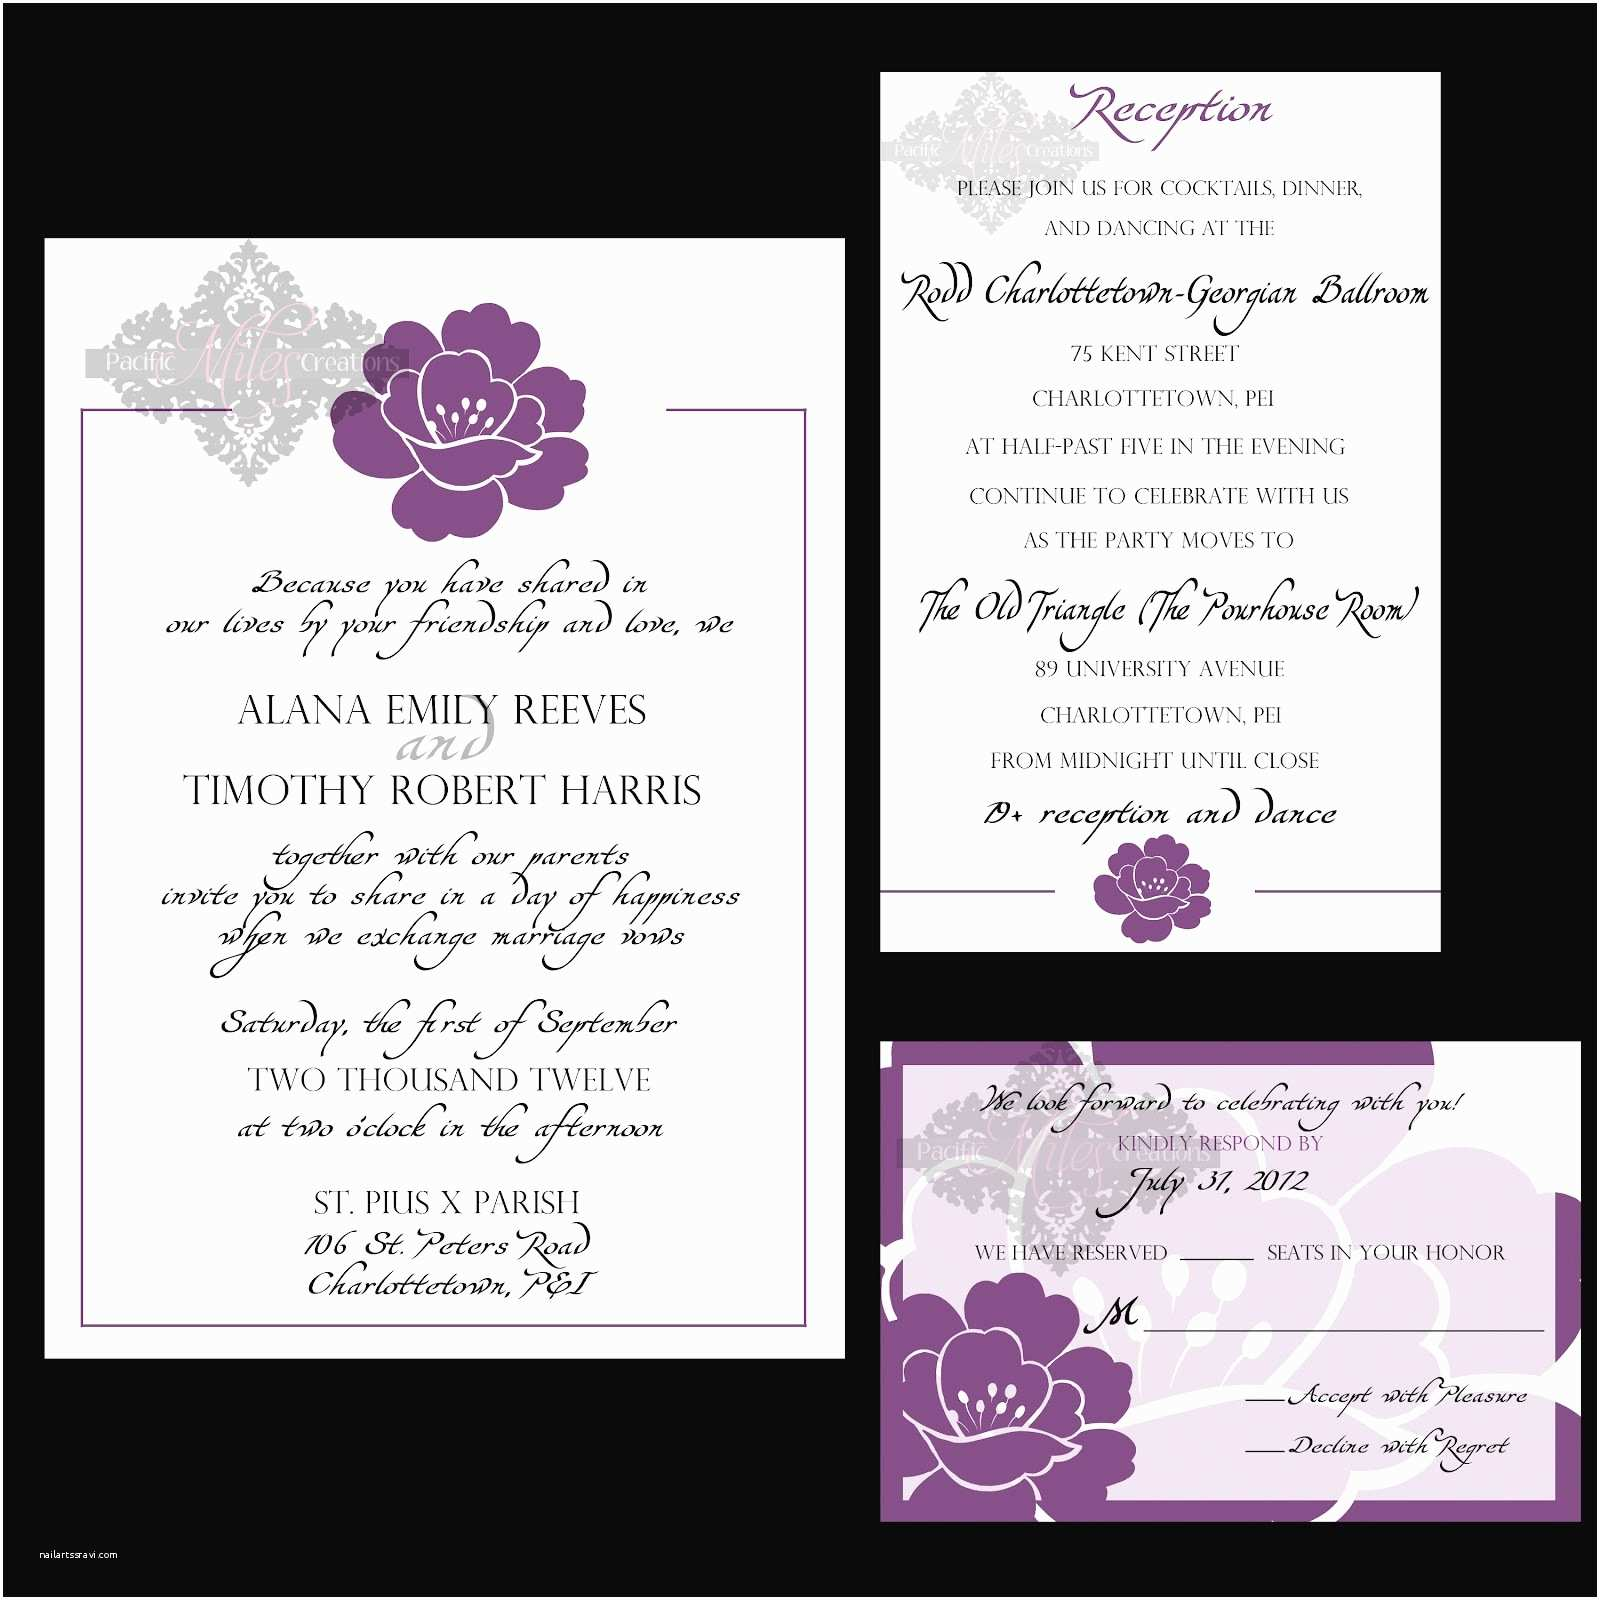 Wedding Invitation With Photo Templates Wedding Invitations Templates Wedding Plan